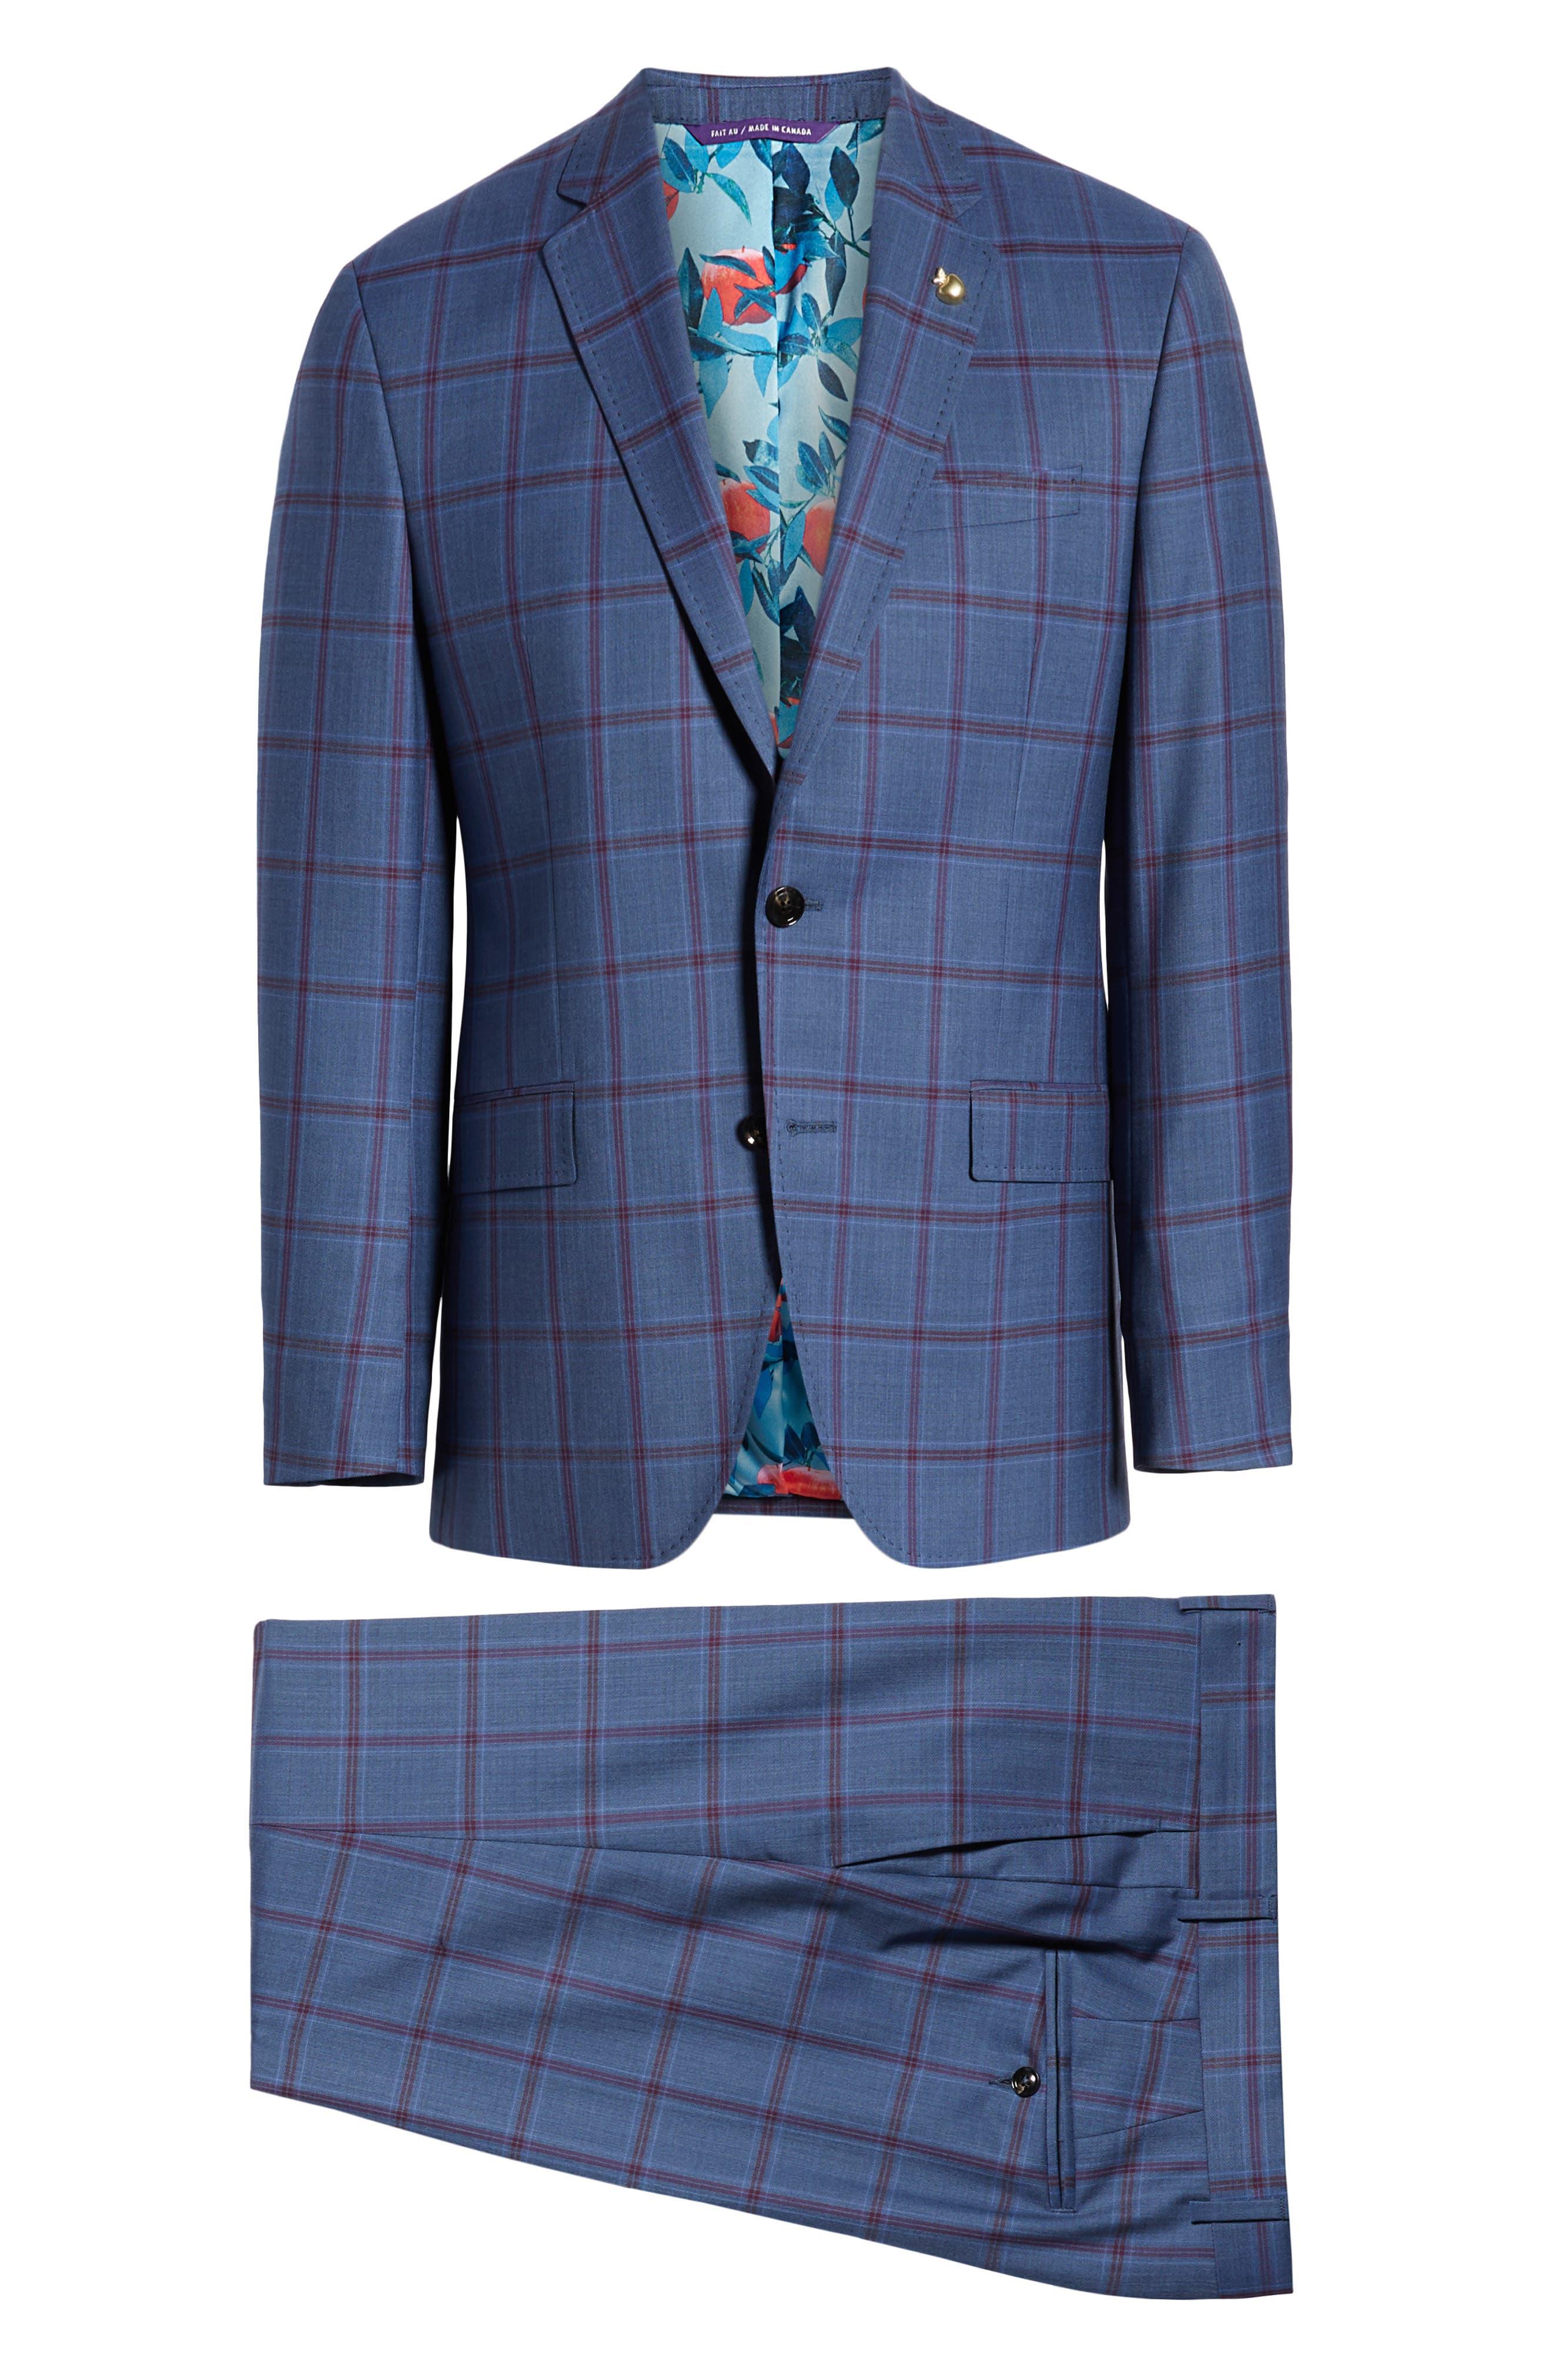 TED BAKER LONDON, Jay Trim Fit Windowpane Suit, Alternate thumbnail 5, color, BLUE